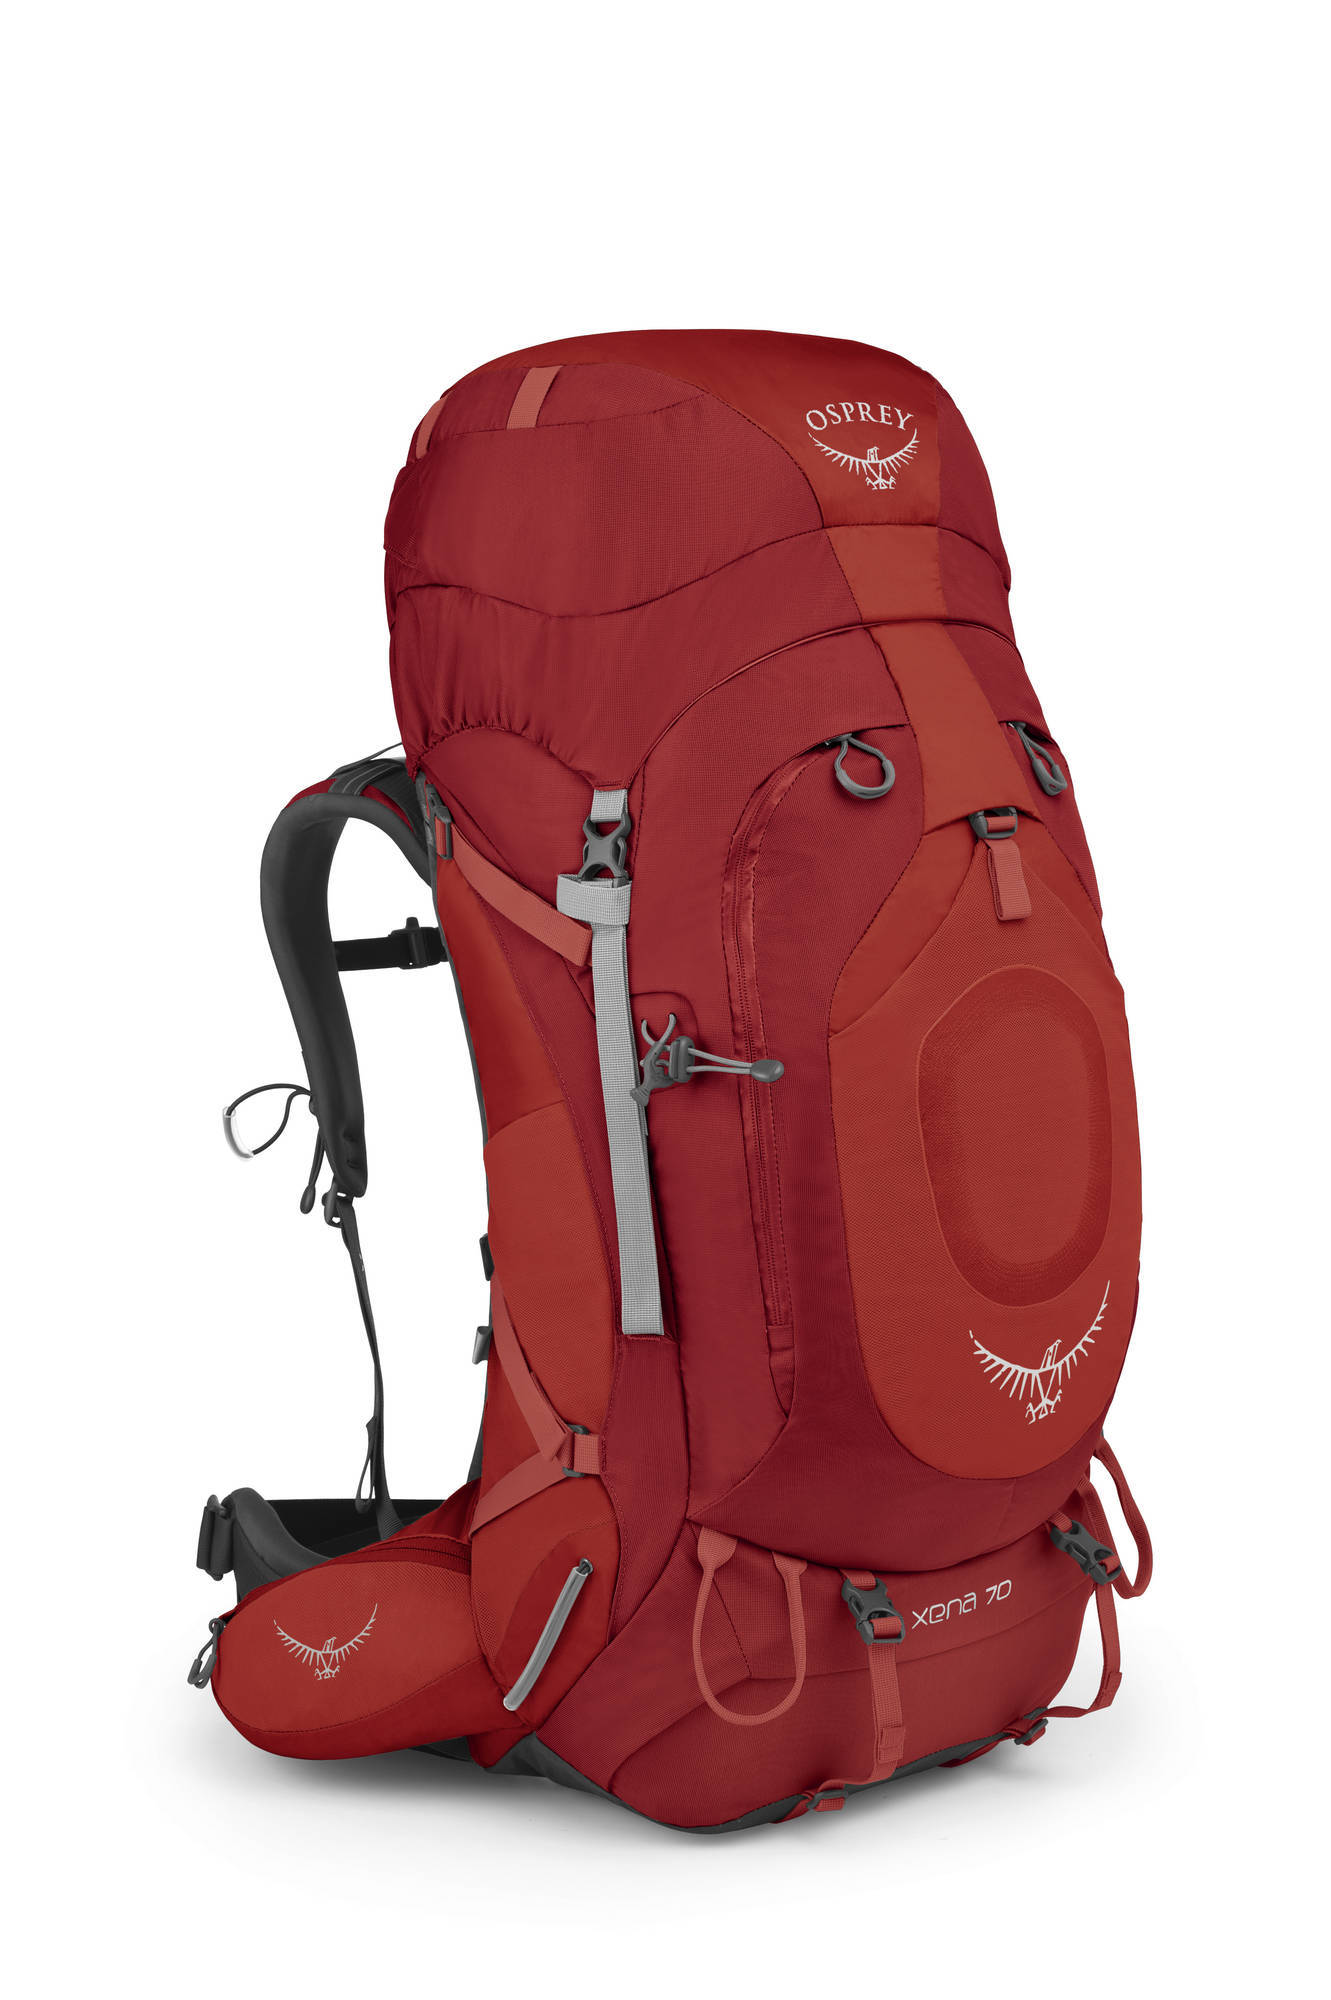 Туристические рюкзаки Рюкзак туристический женский Osprey Xena 70 Xena_70_Side_Ruby_Red_web.jpg